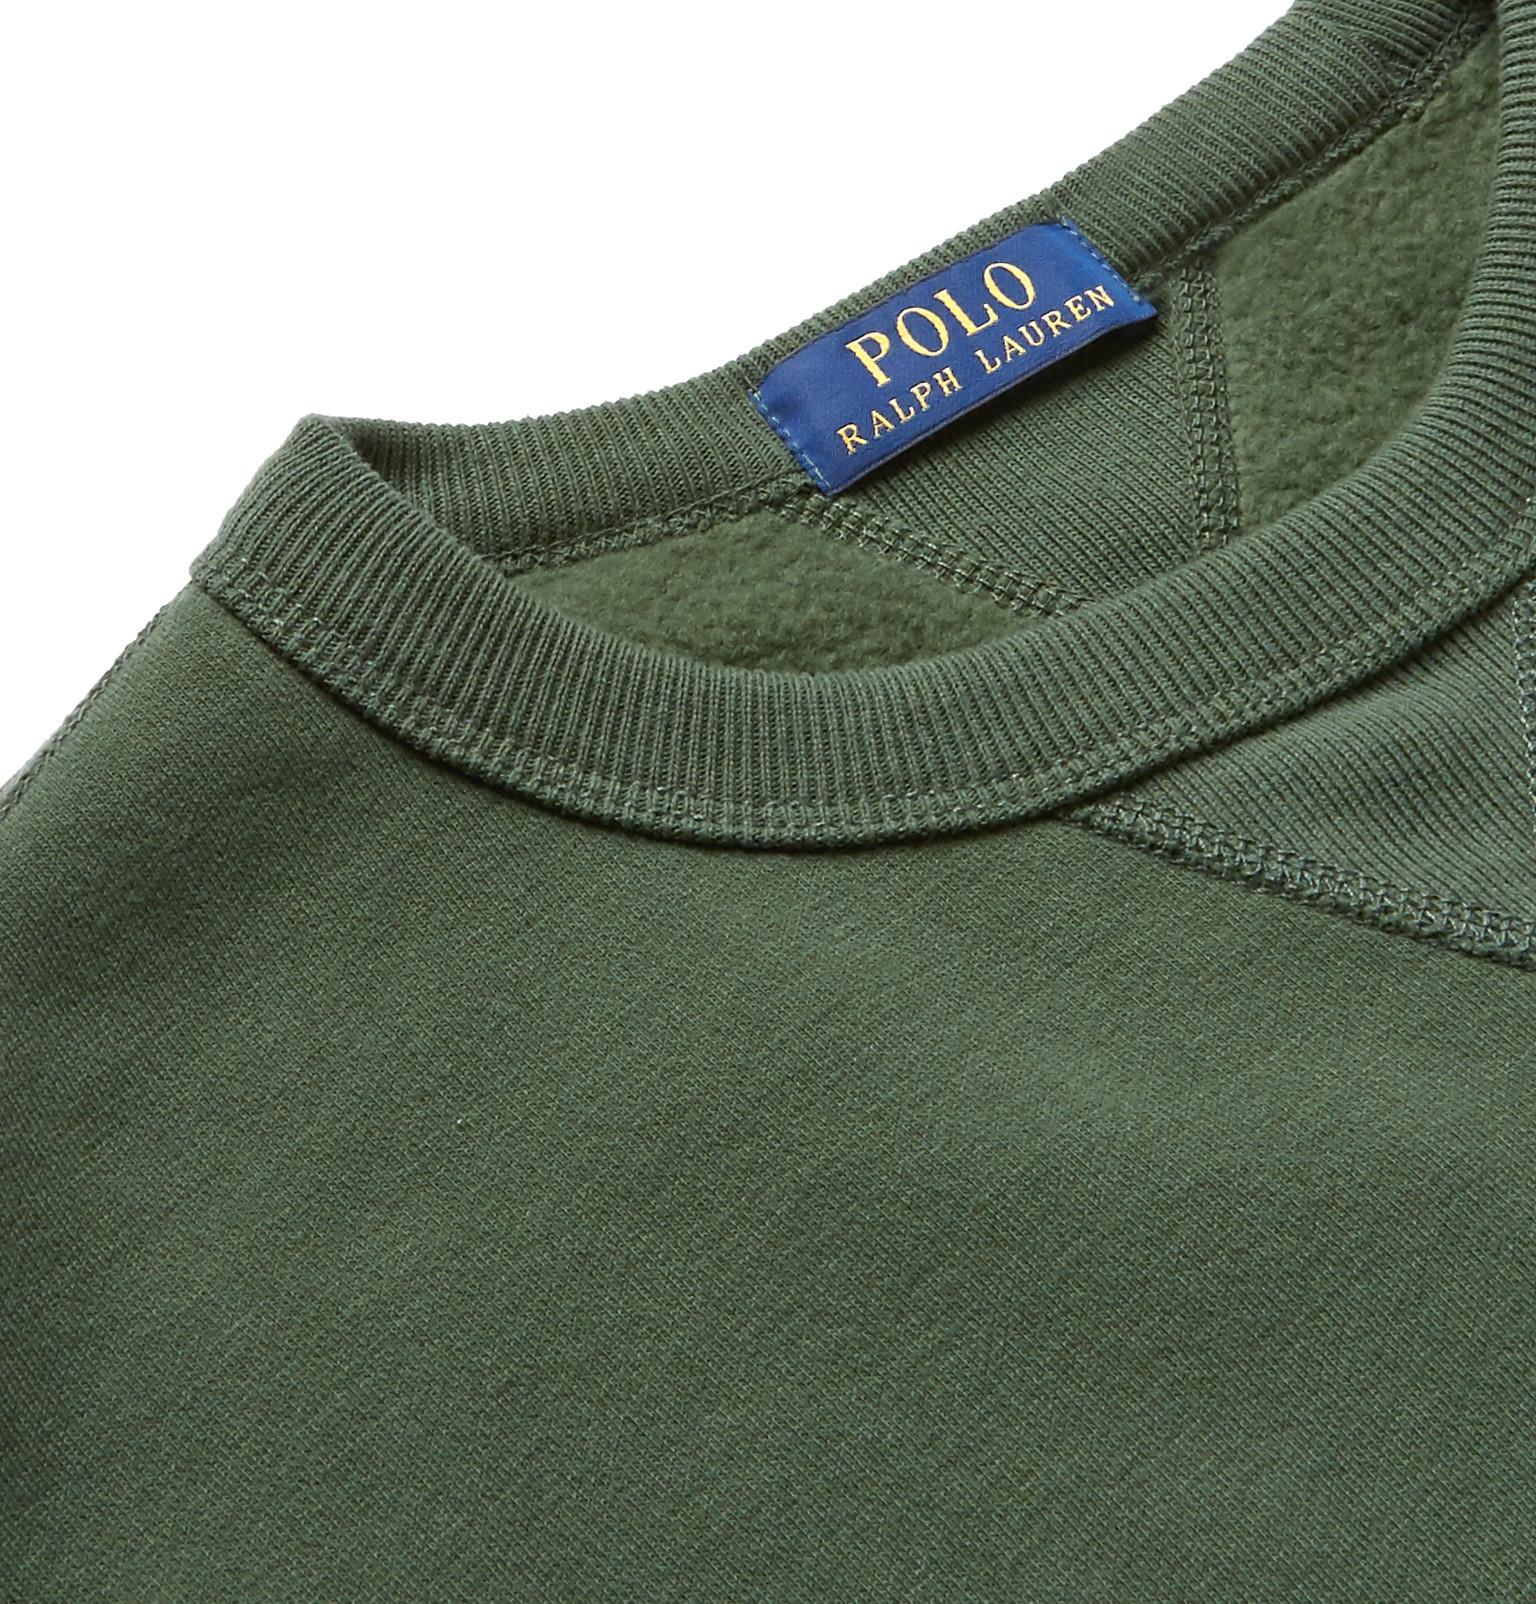 Fleece Blend Ralph Jersey Cotton Back In Sweatshirt Lauren Polo wqHdEXxgg